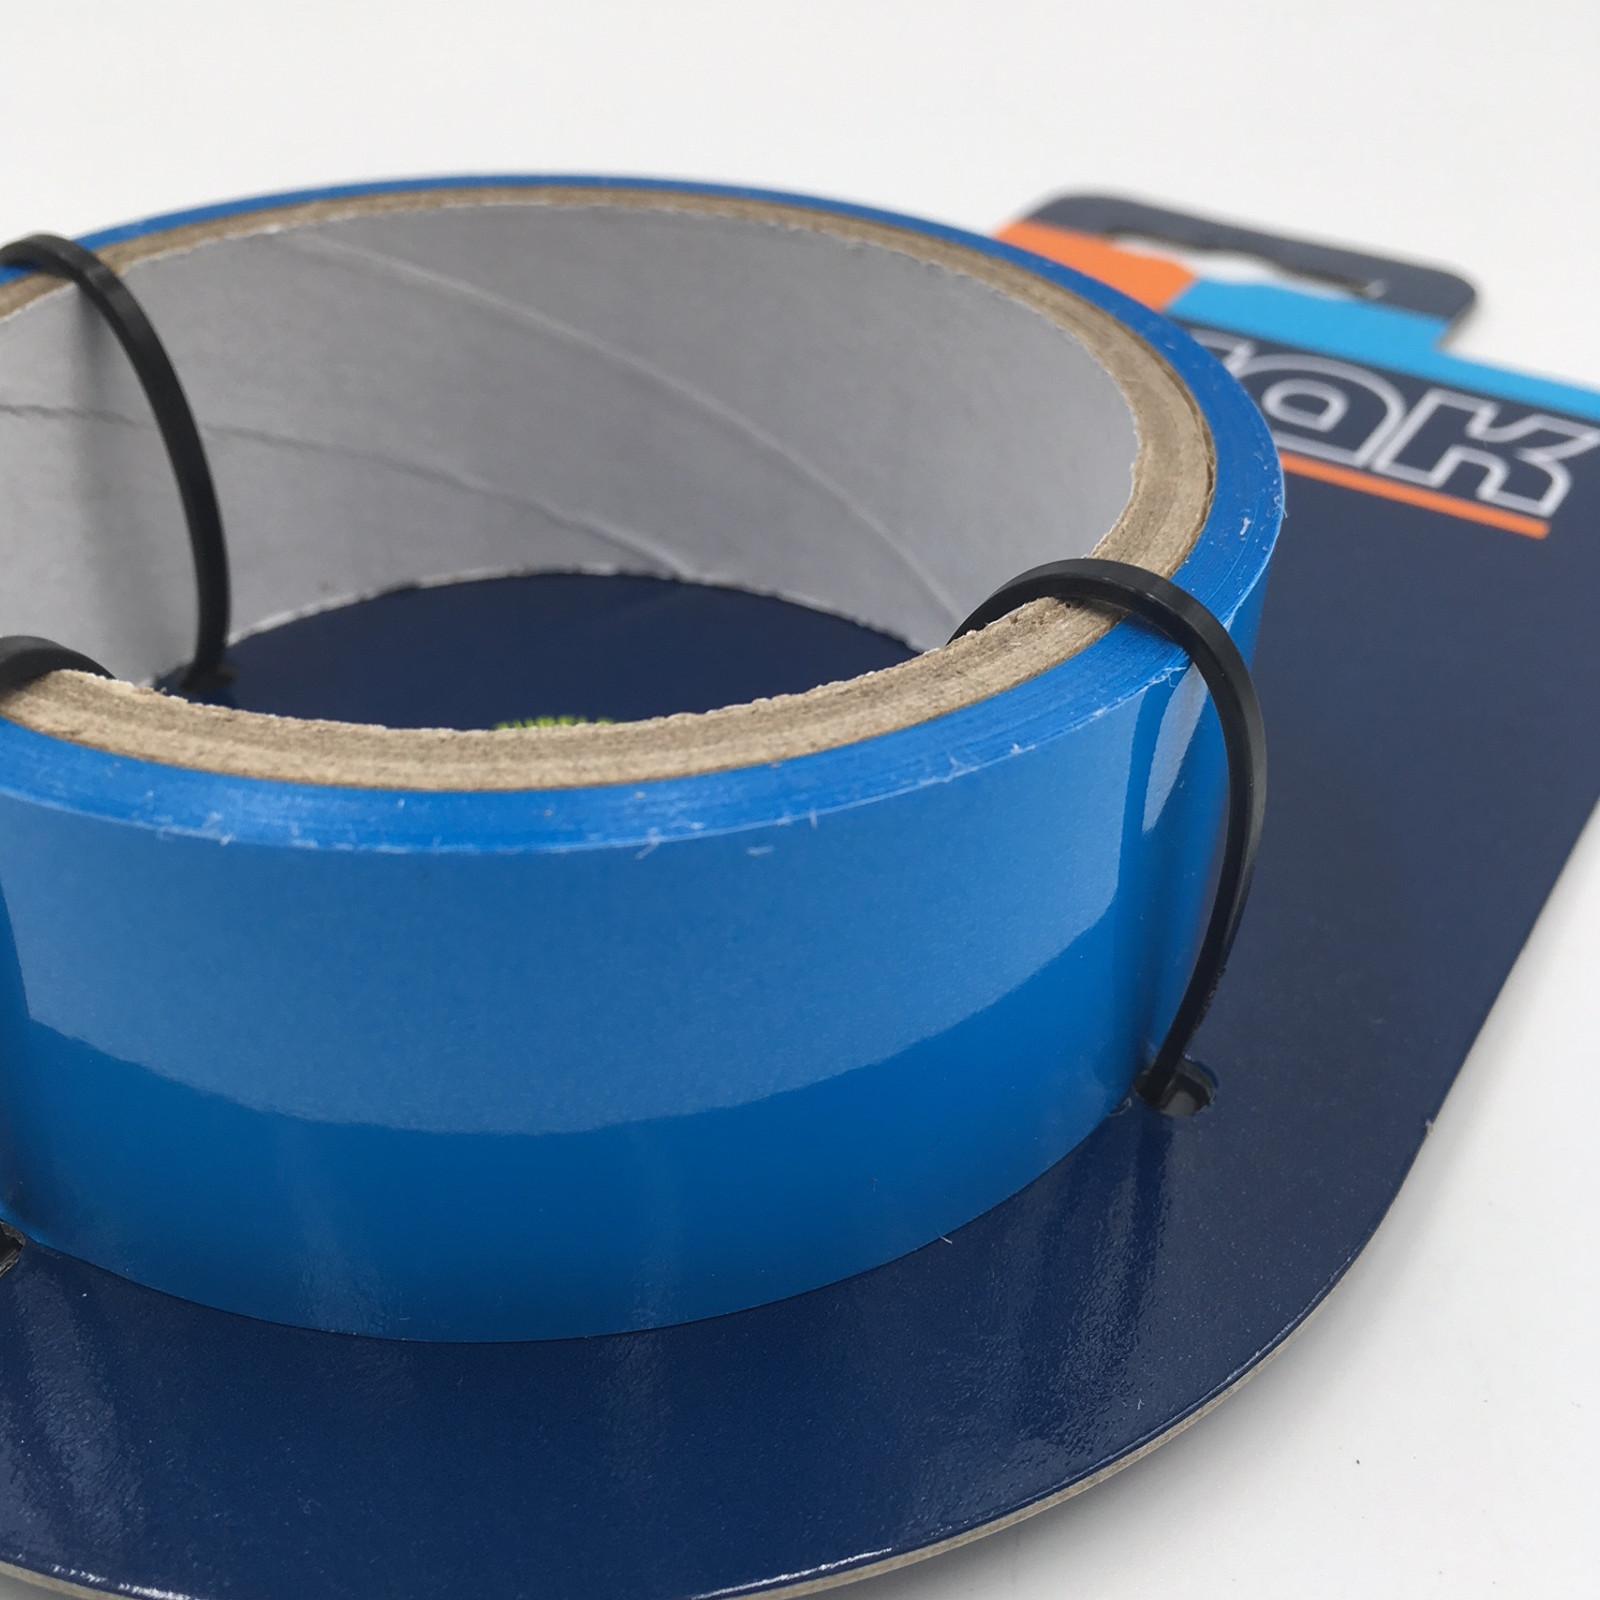 Nutrak-Tubeless-Ready-Waterproof-Rim-Tape-Blue-10m-Roll thumbnail 16